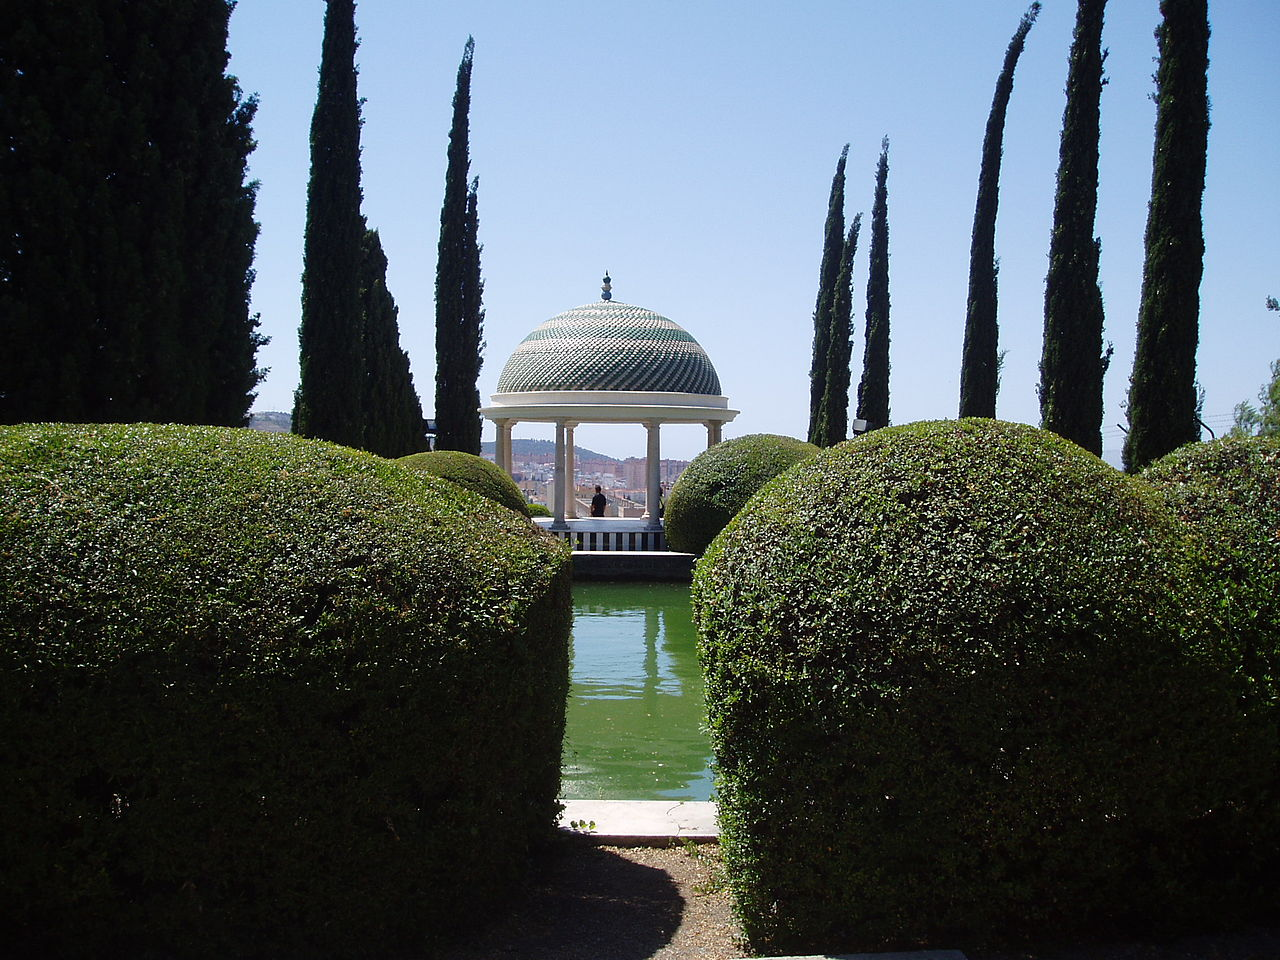 jardin botanuqe de la concepcion malaga